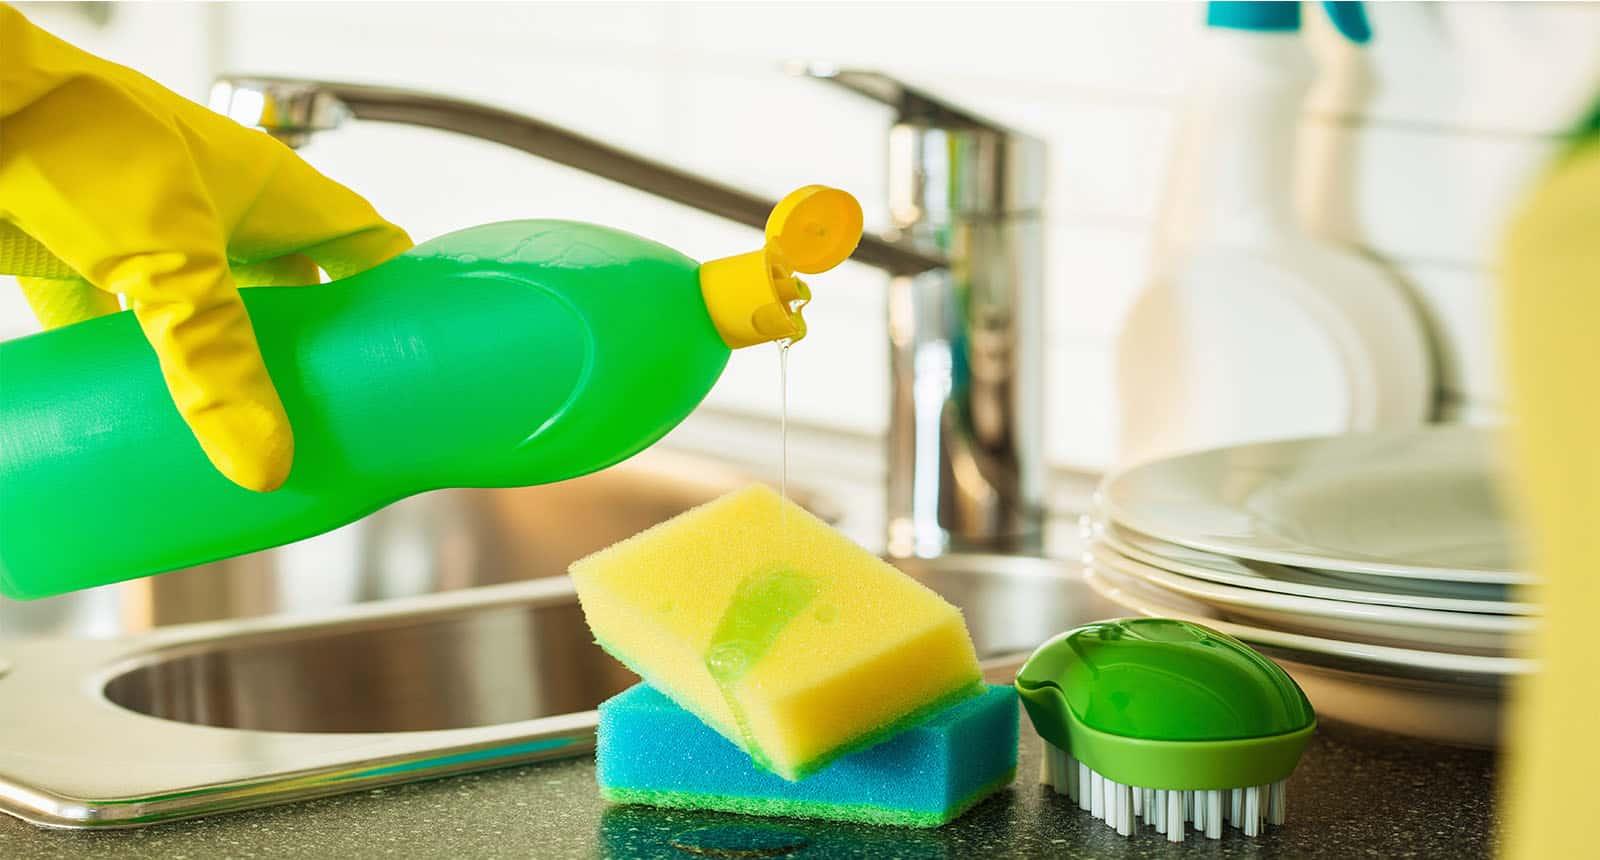 Pouring Dishwashing Liquid